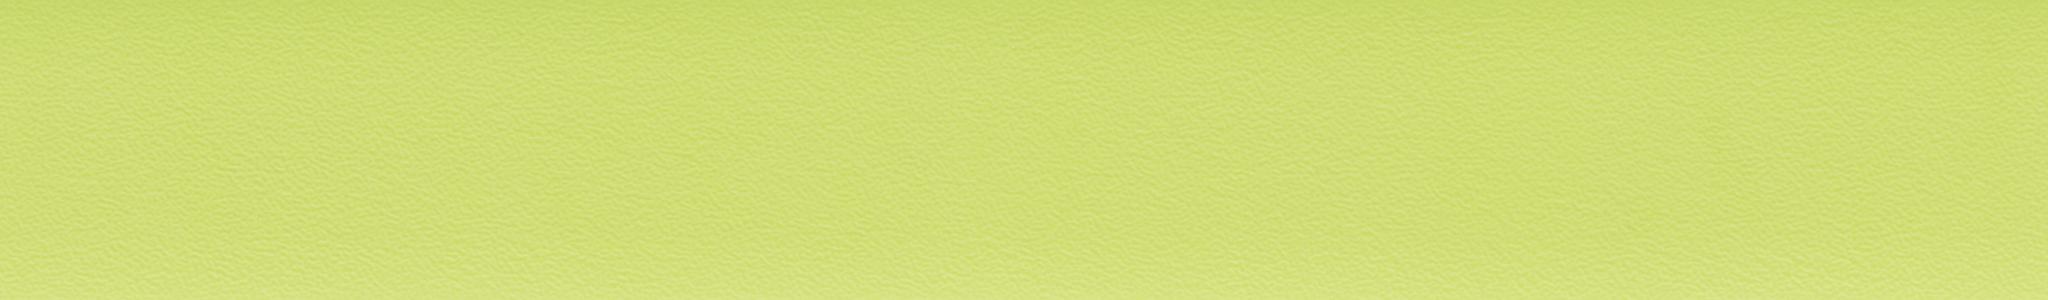 HU 168996 ABS hrana zelená perla 101